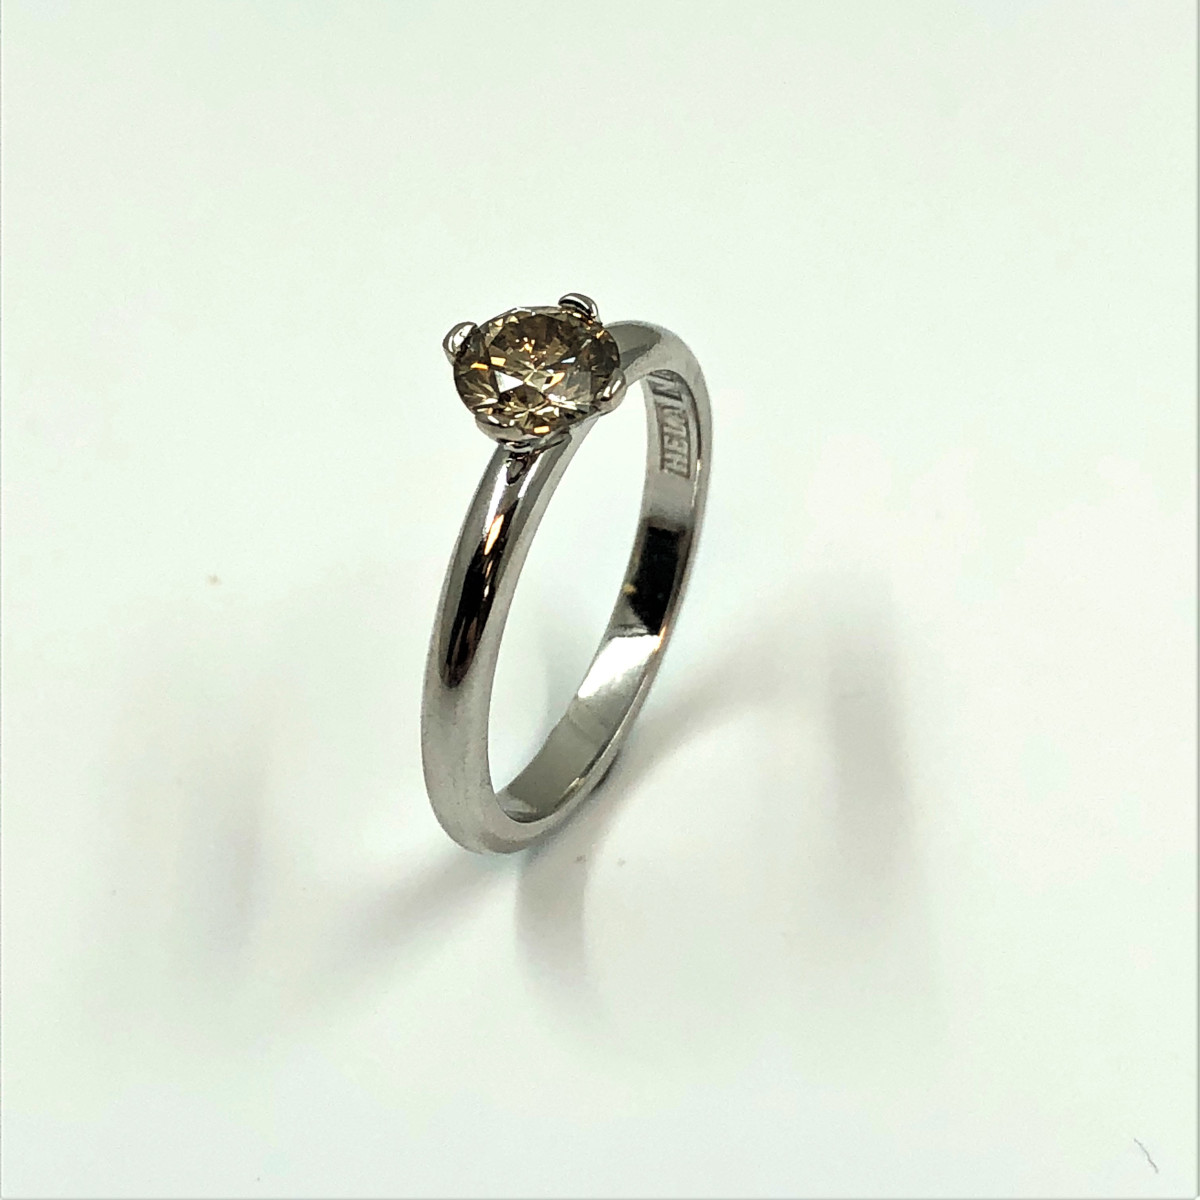 Vitguldsring, enstensring, brun diamant